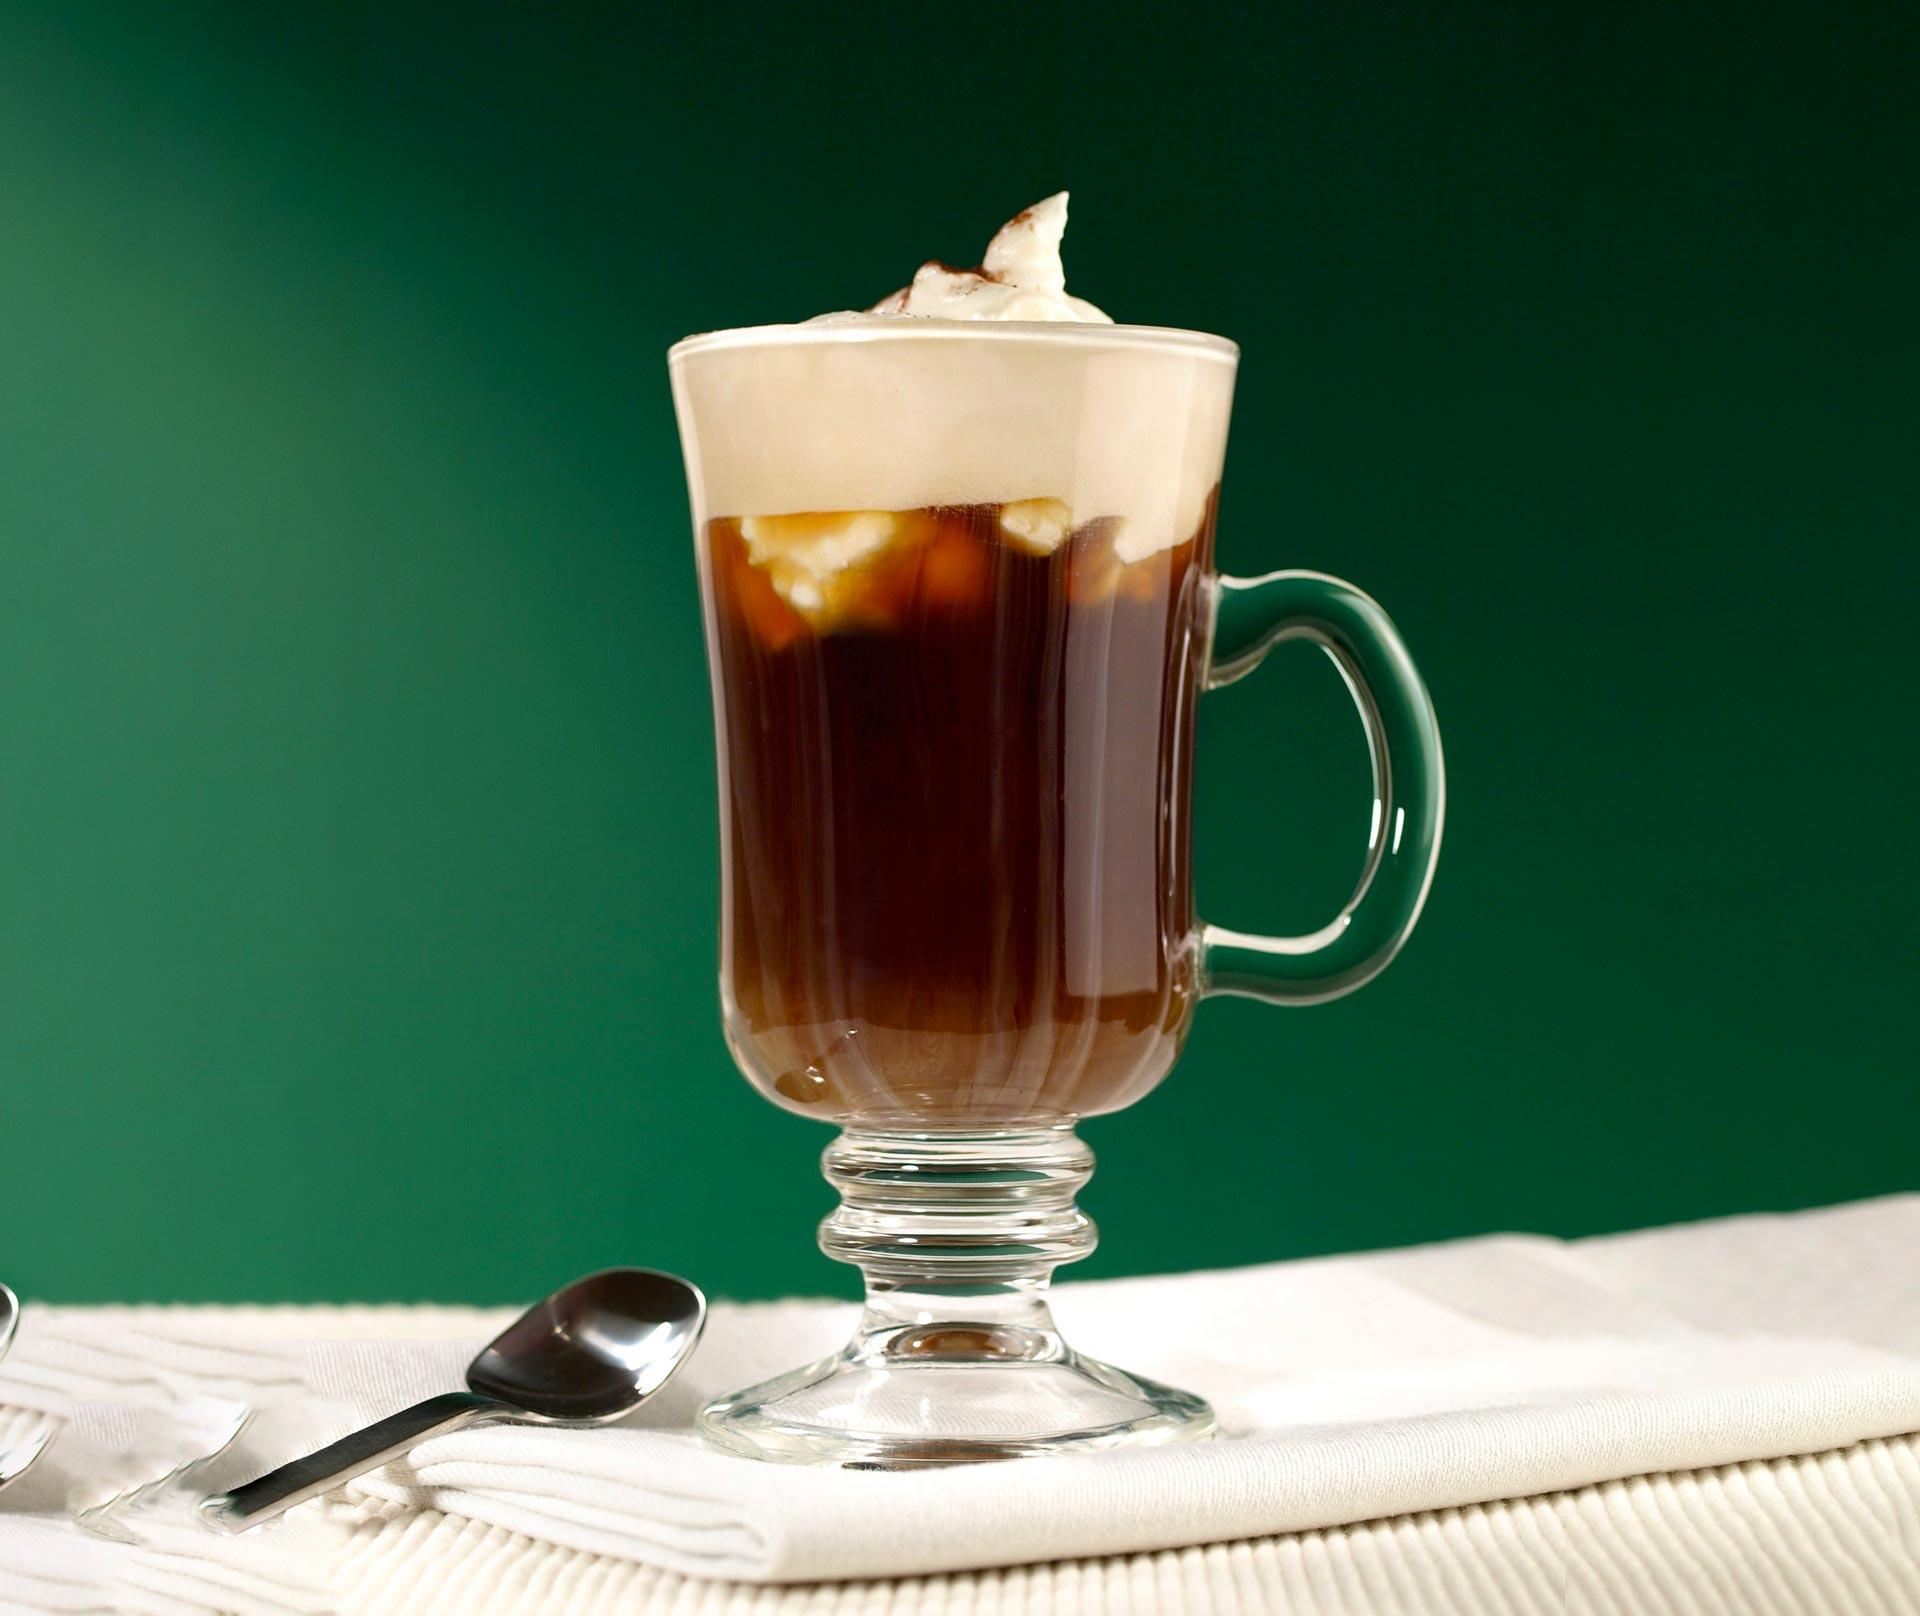 Making the classic Irish coffee